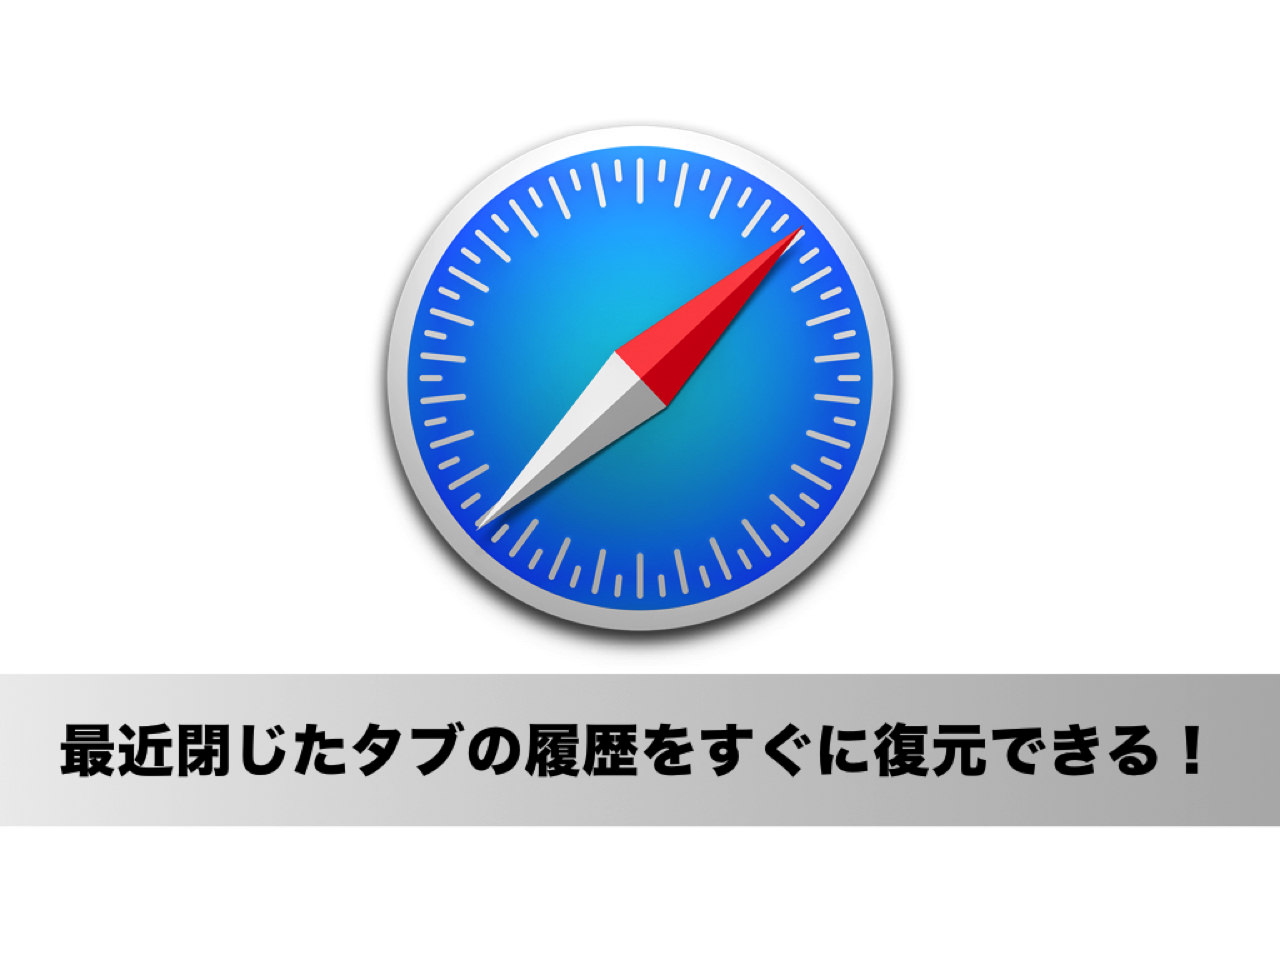 Macの「Split View(スプリット・ビュー)」をショートカットで起動できるアプリ「SplitViewShortcut」